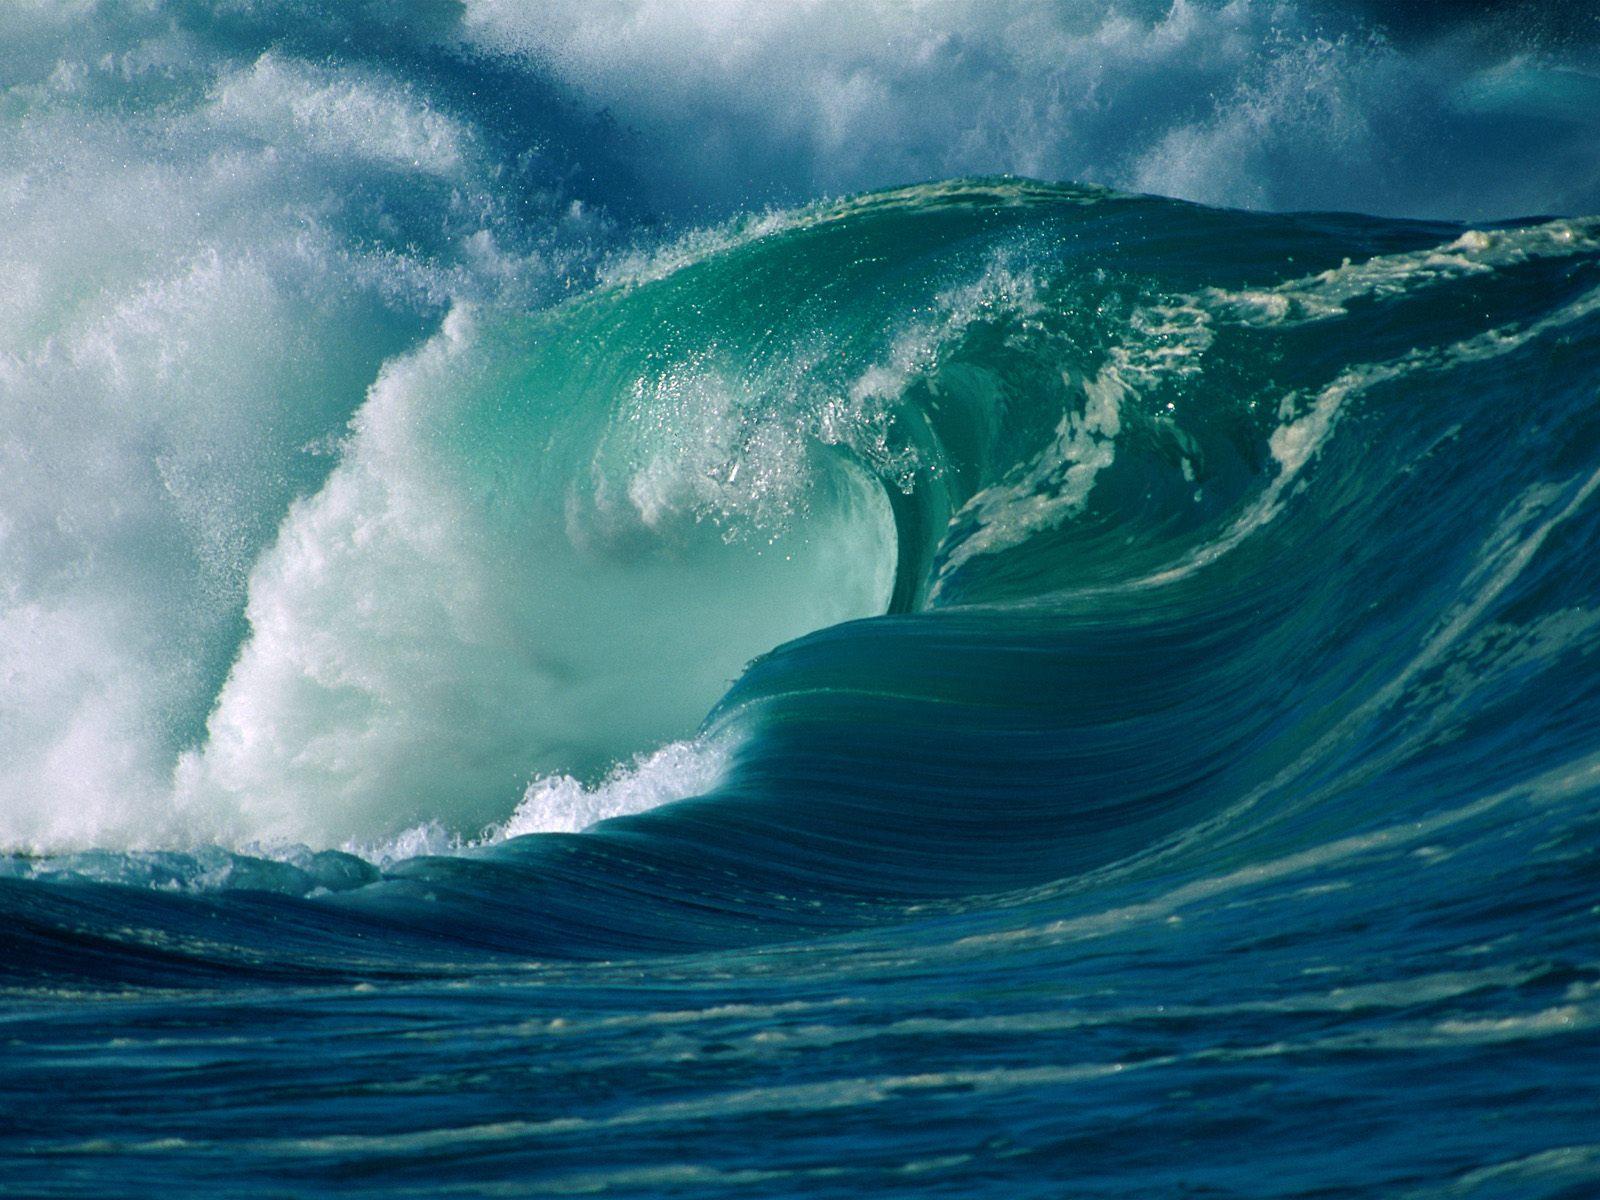 http://4.bp.blogspot.com/-a9YE0XwLR7Q/TiPPtXXo6LI/AAAAAAAAAIc/PCa6_2tSFf0/s1600/Surf_great_waves_06.jpg